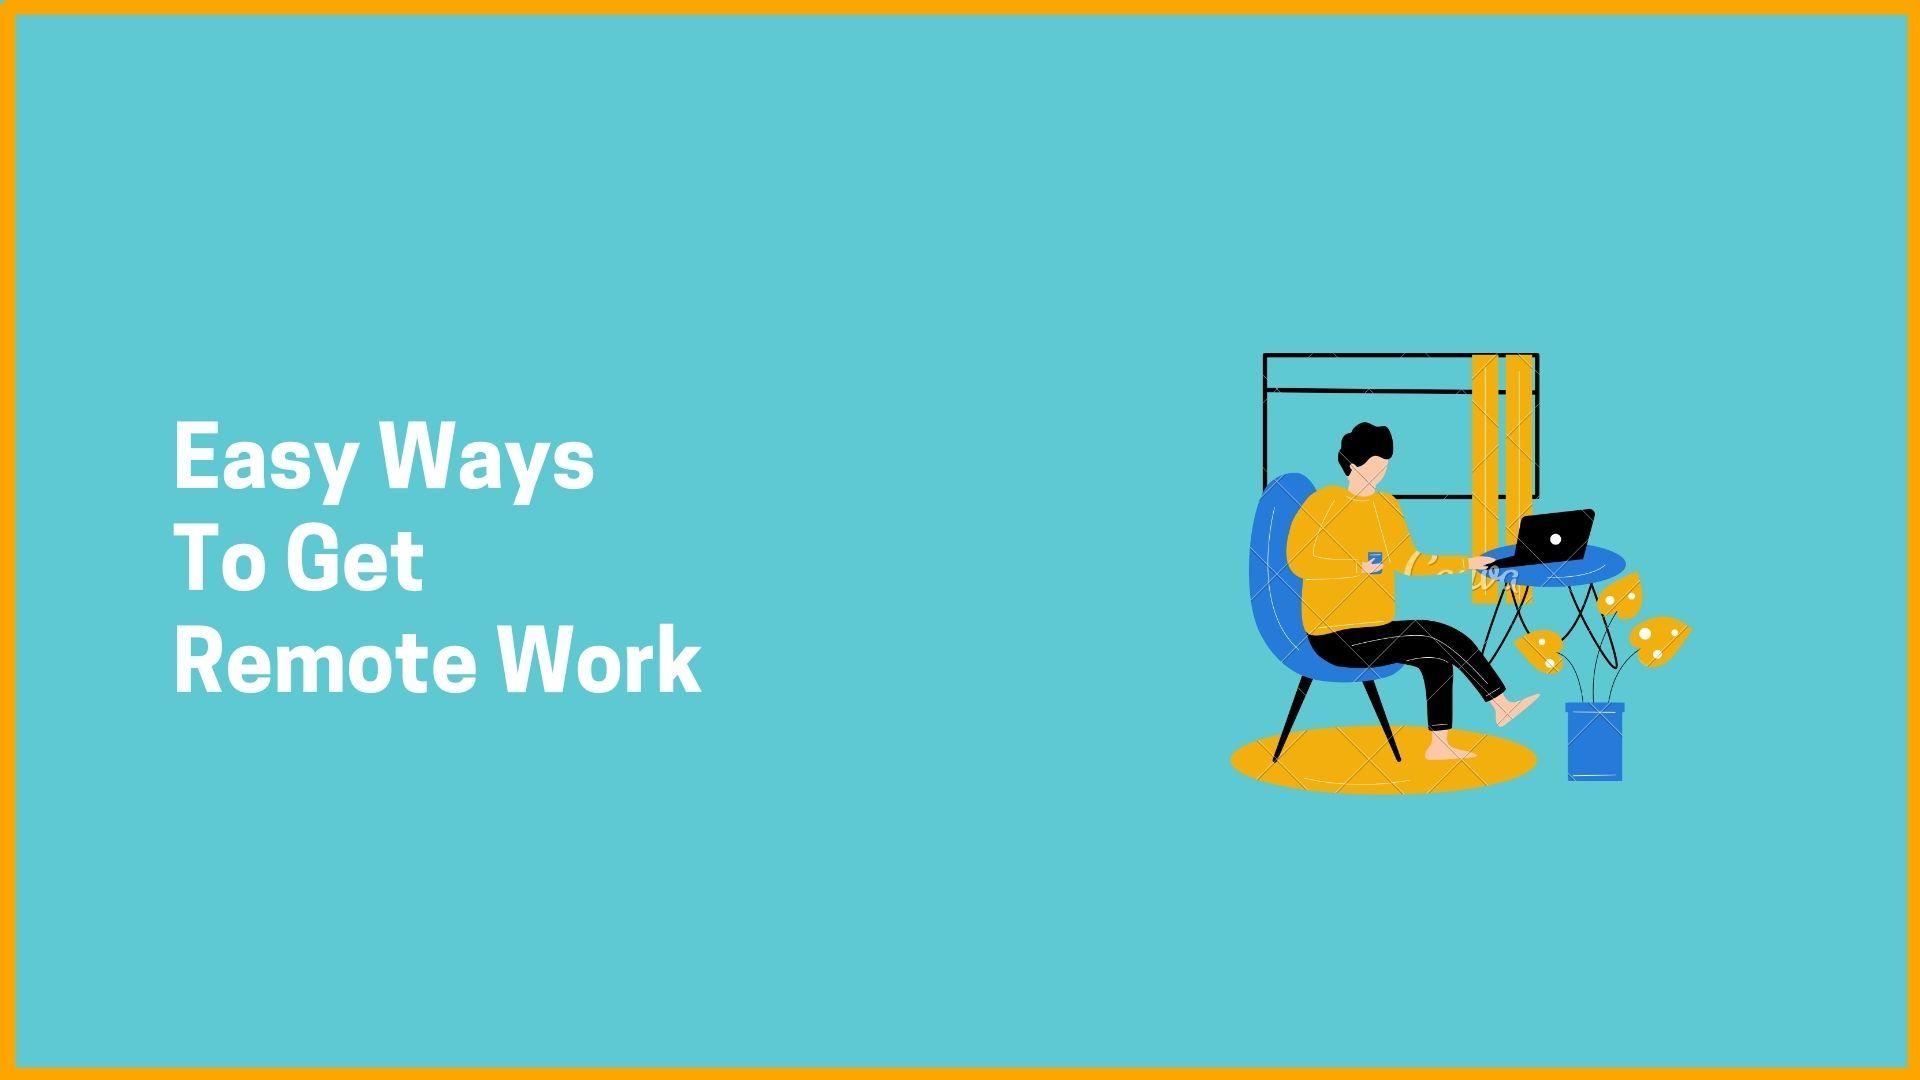 Easy Ways To Get Remote Work